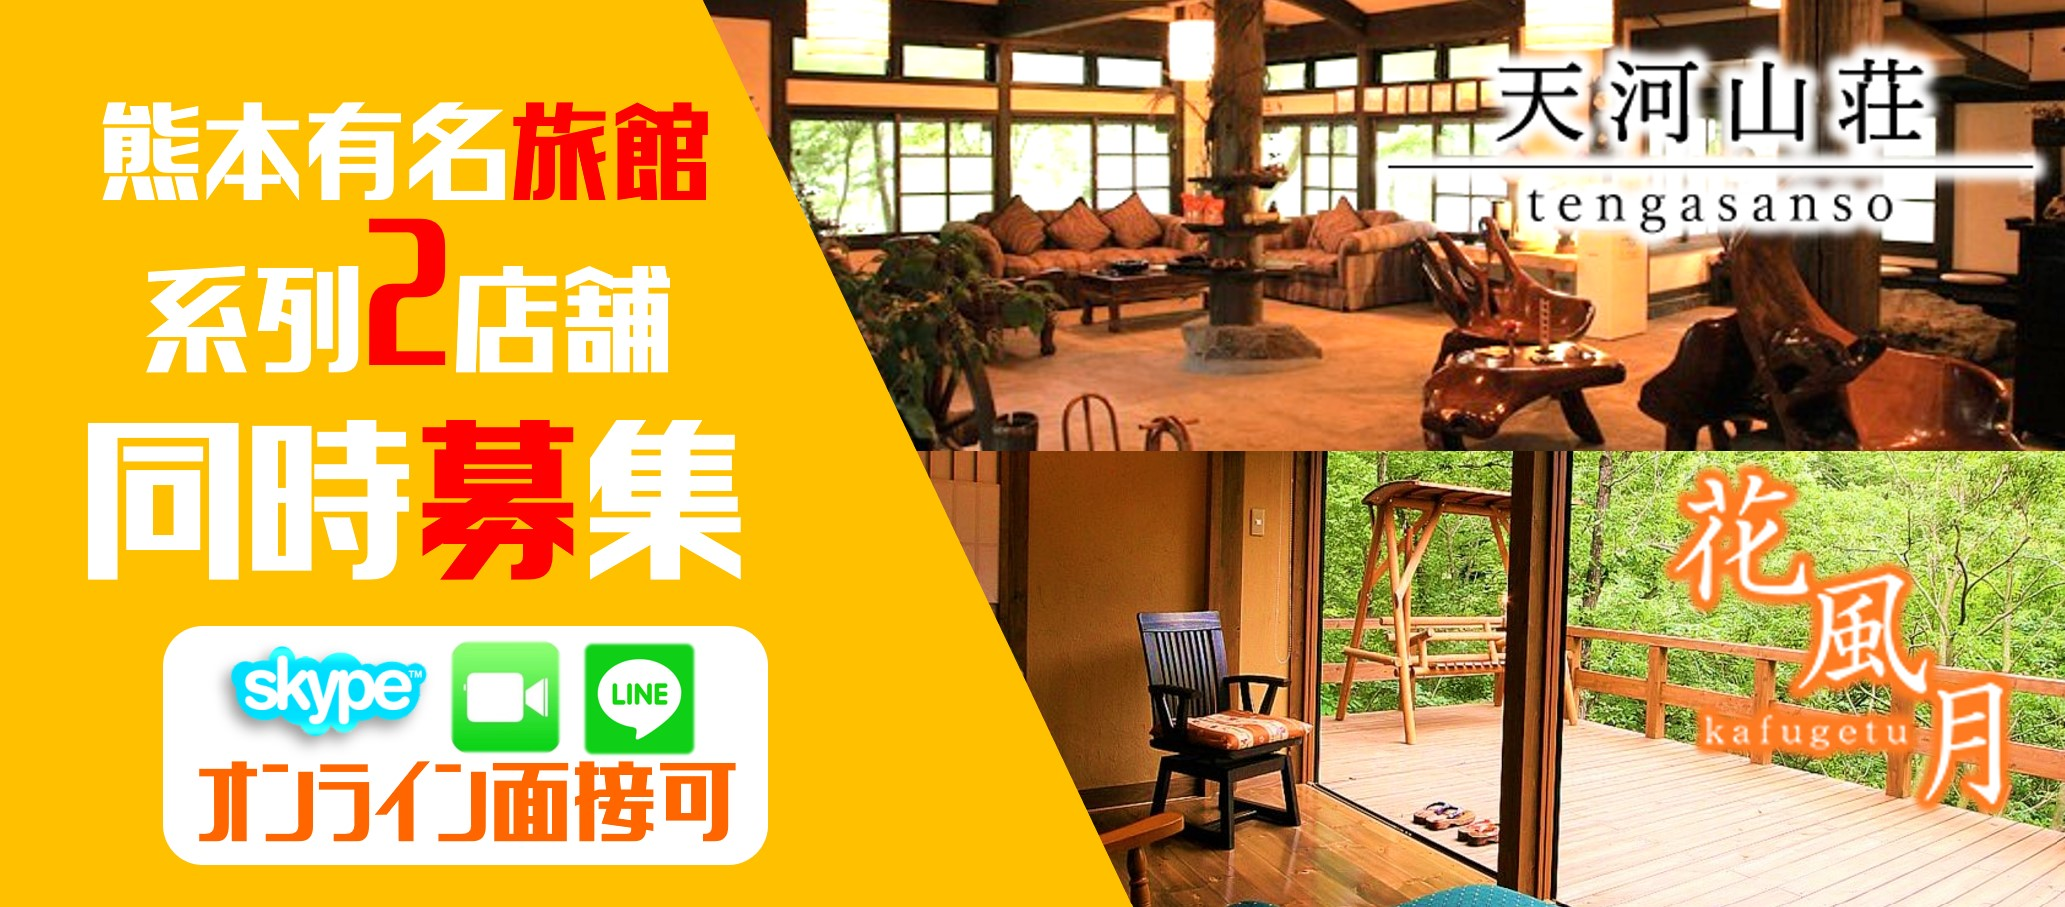 熊本有名旅館 系列2店舗 同時募集 オンライン面接可